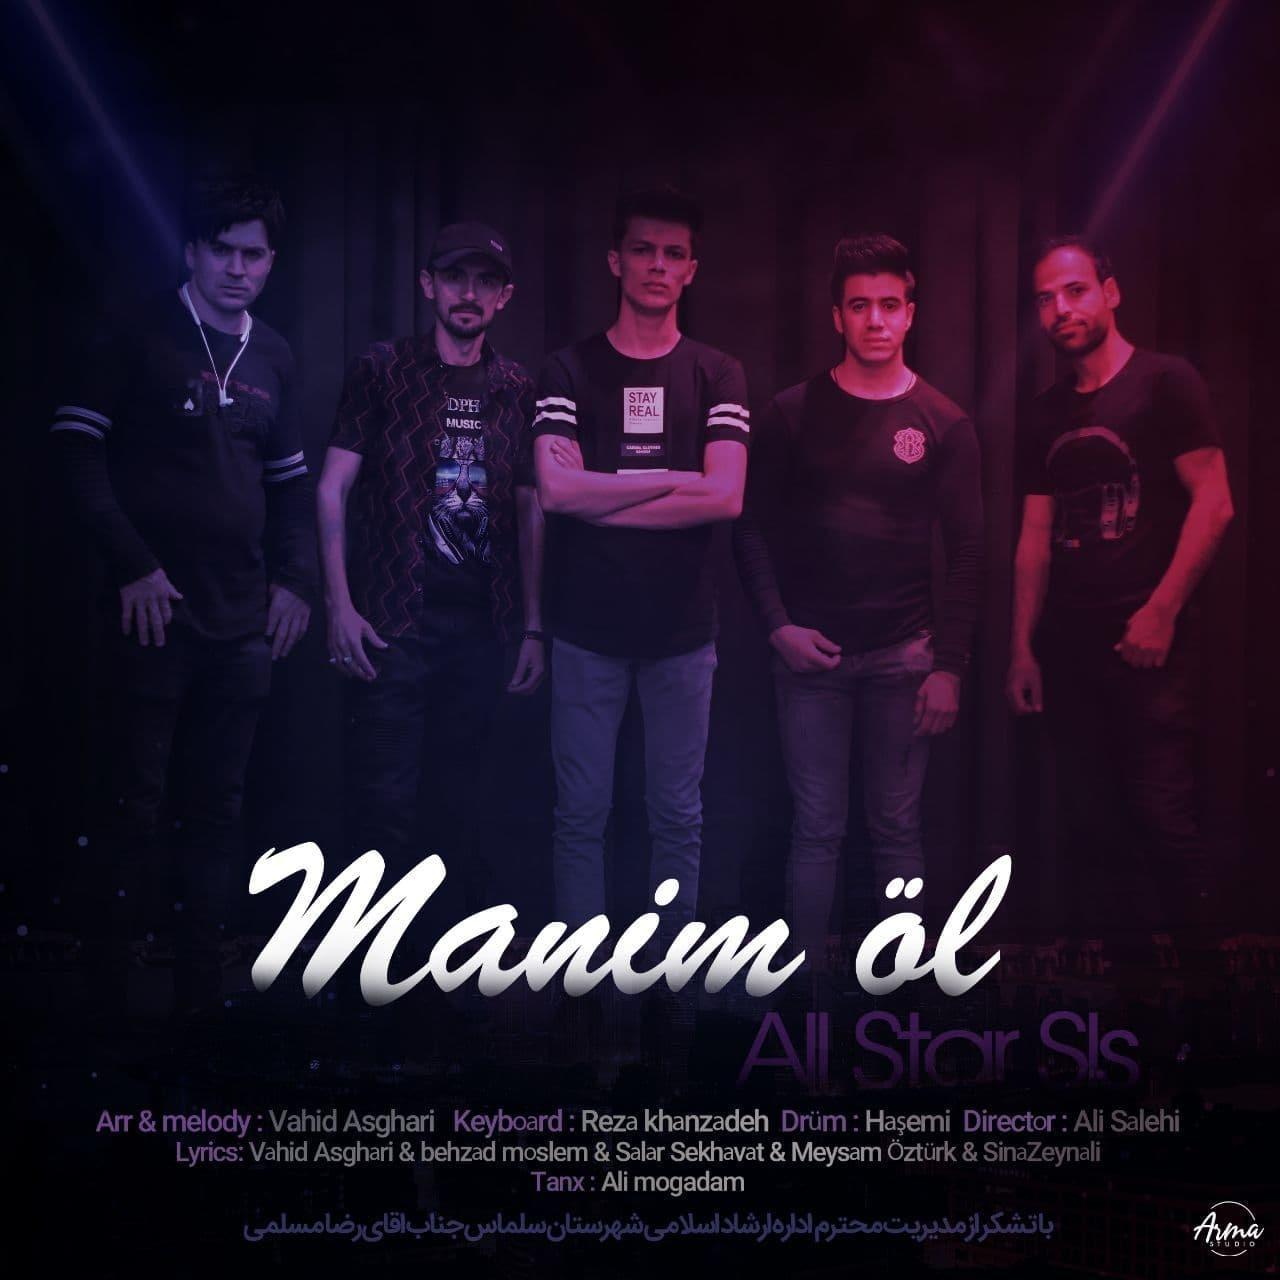 All Star Sls – Manim Ol